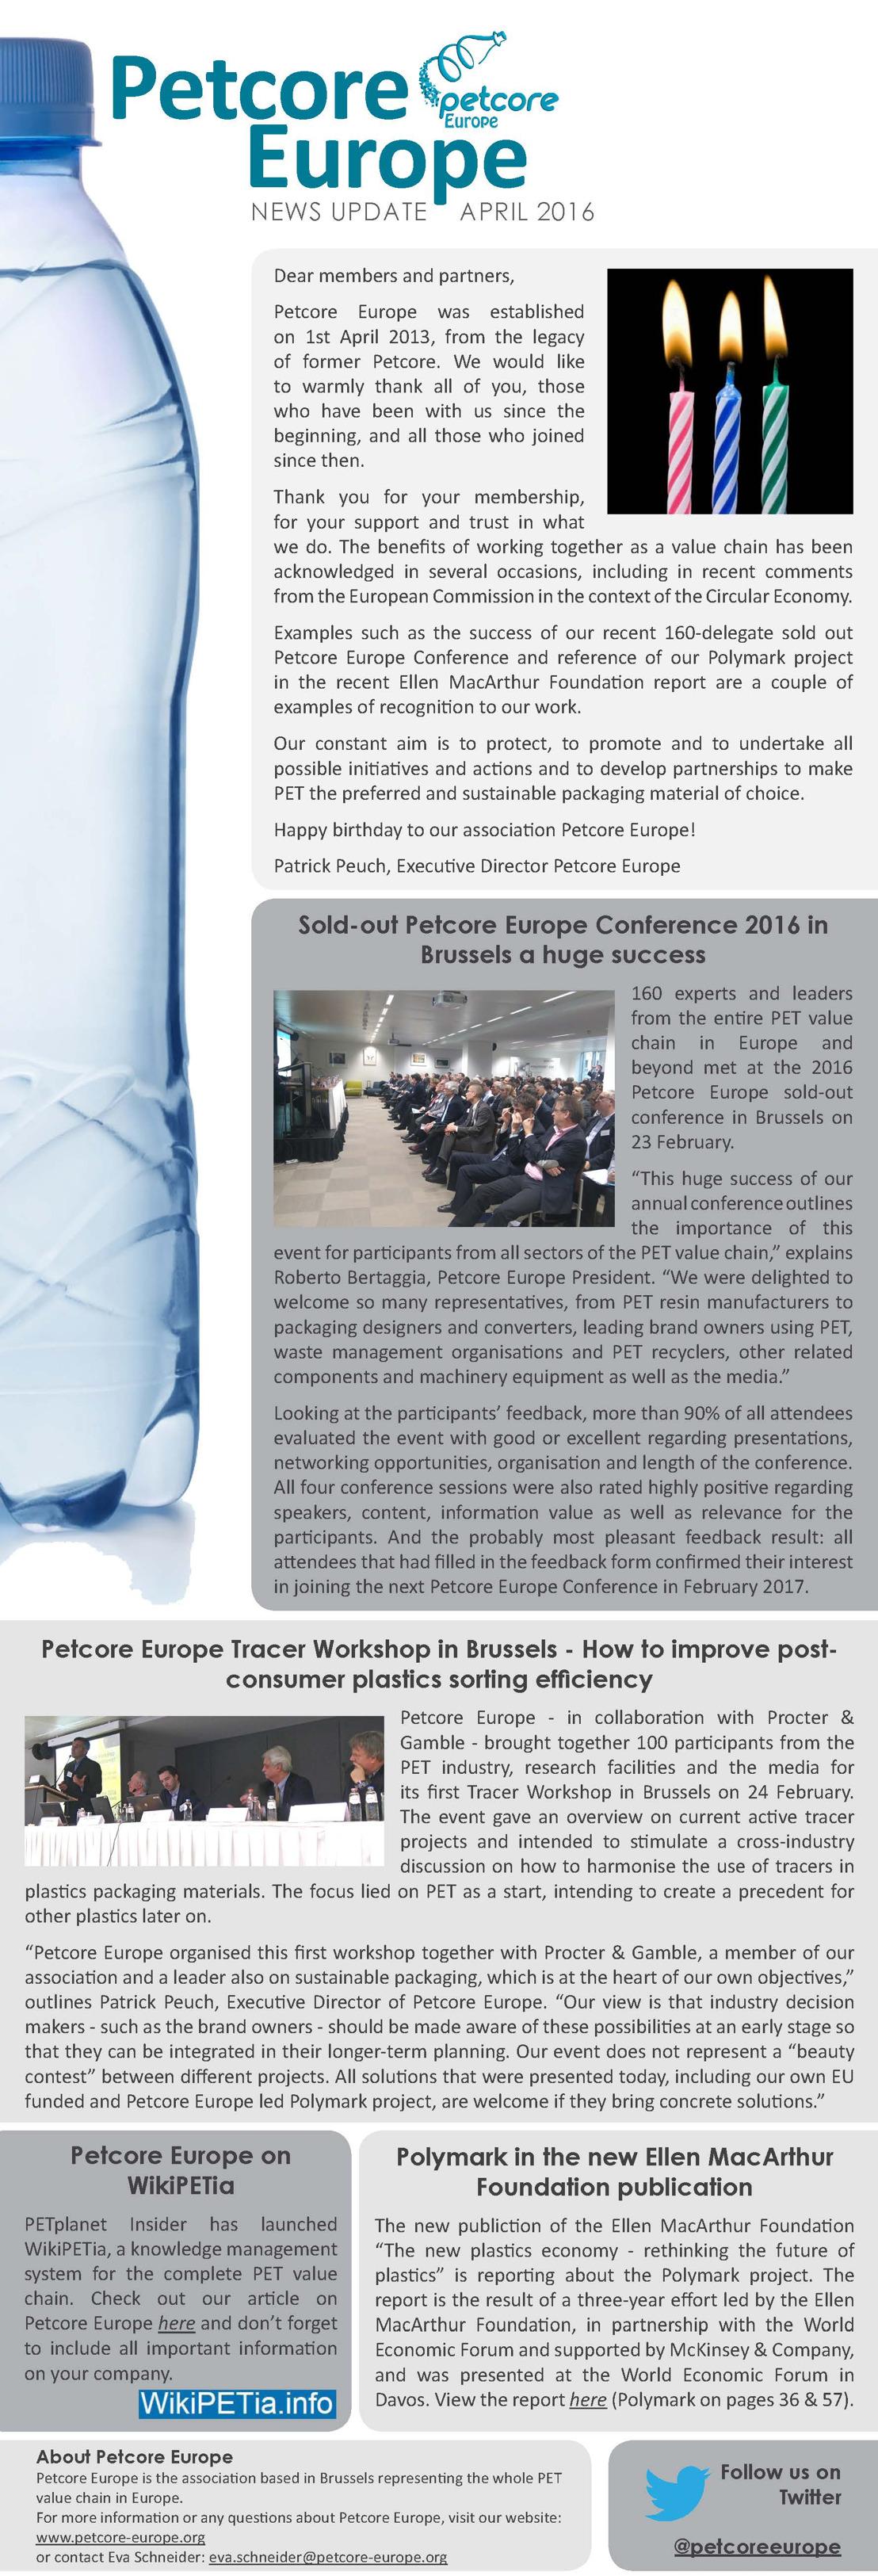 Petcore Europe News Update - April 2016